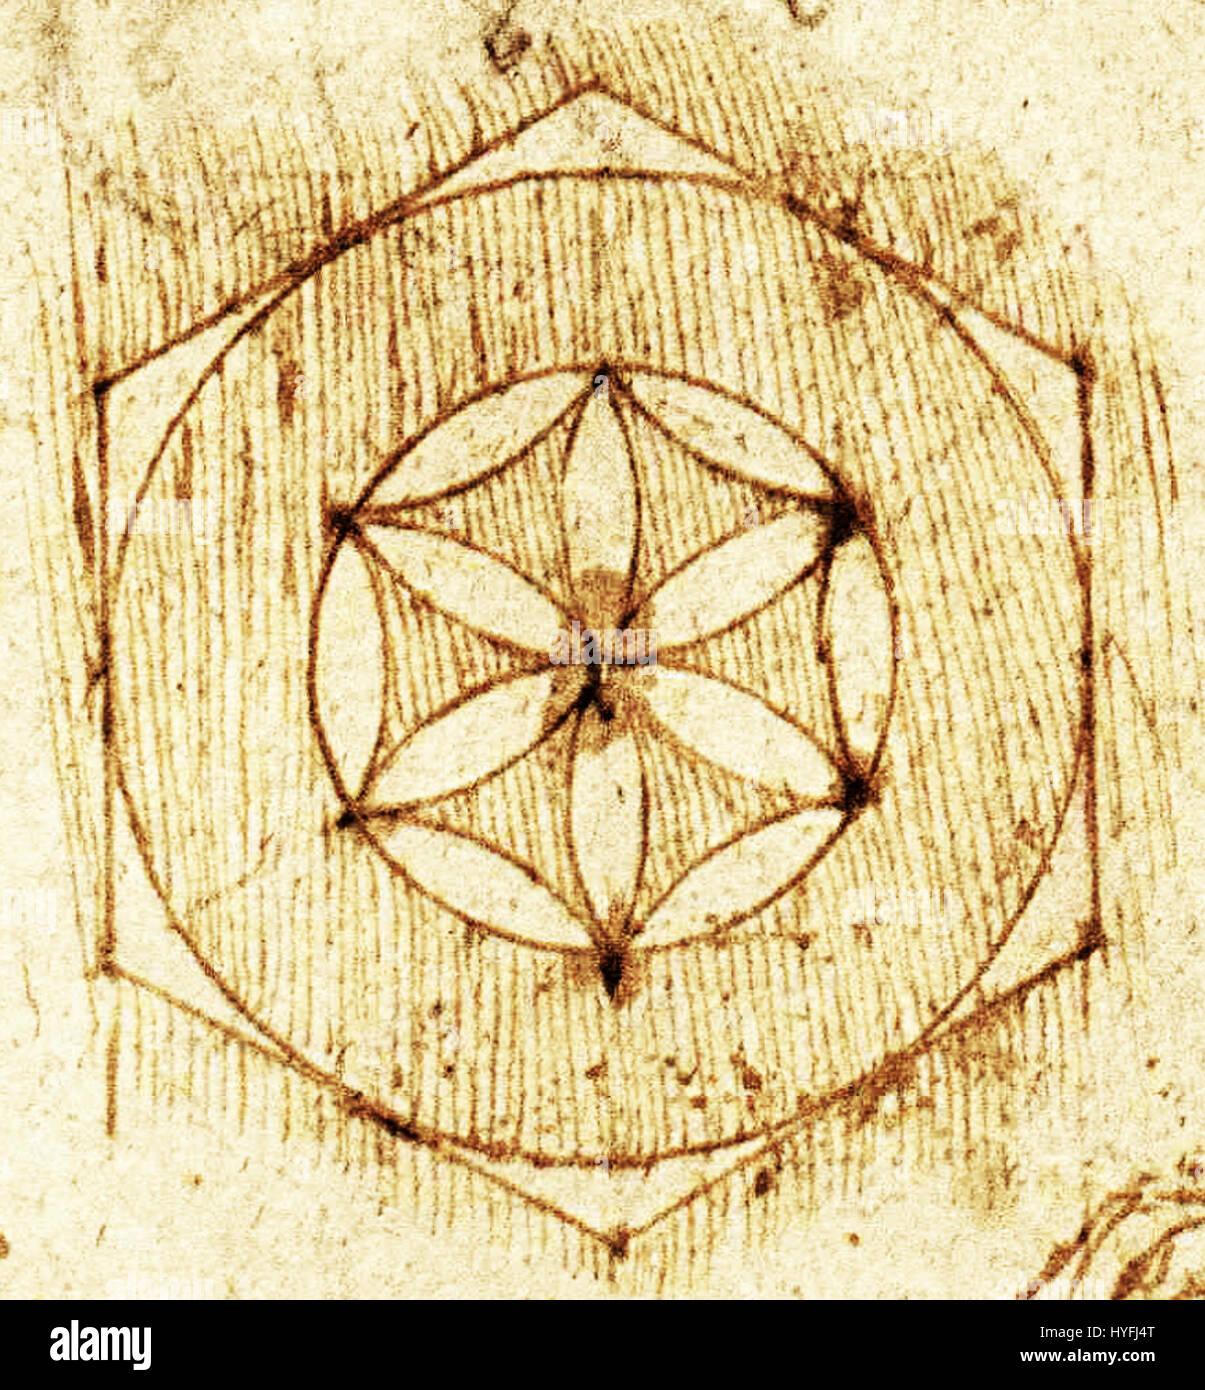 Leonardo Da Vinci Codex Atlanticus Folio 459r Detail1 Stock Photo